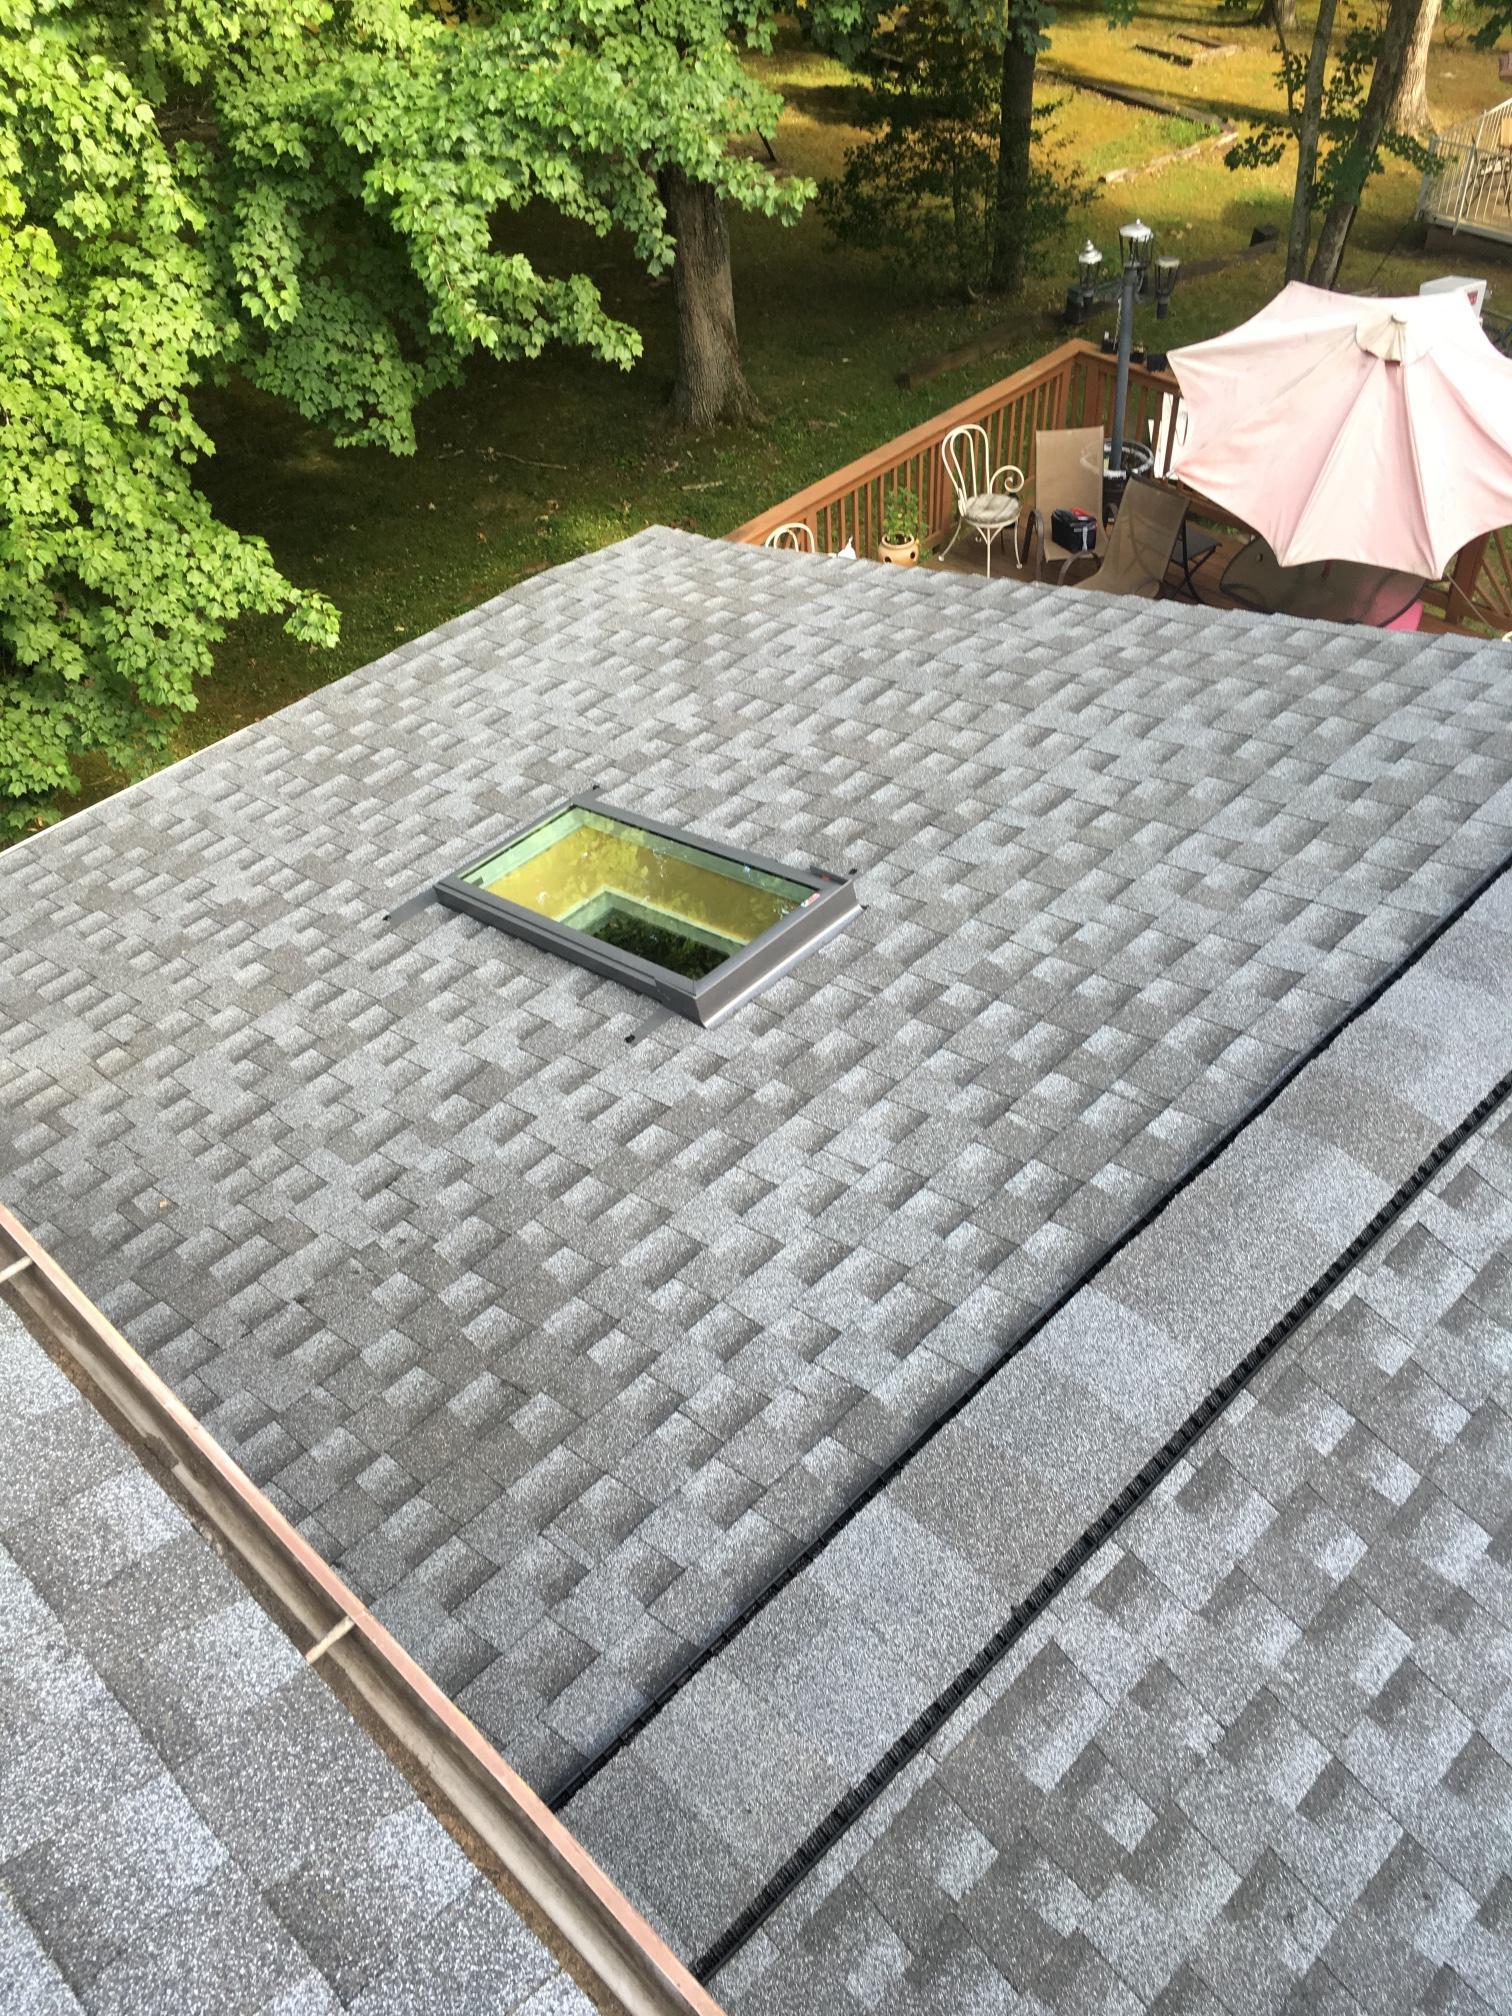 Installed skylight.